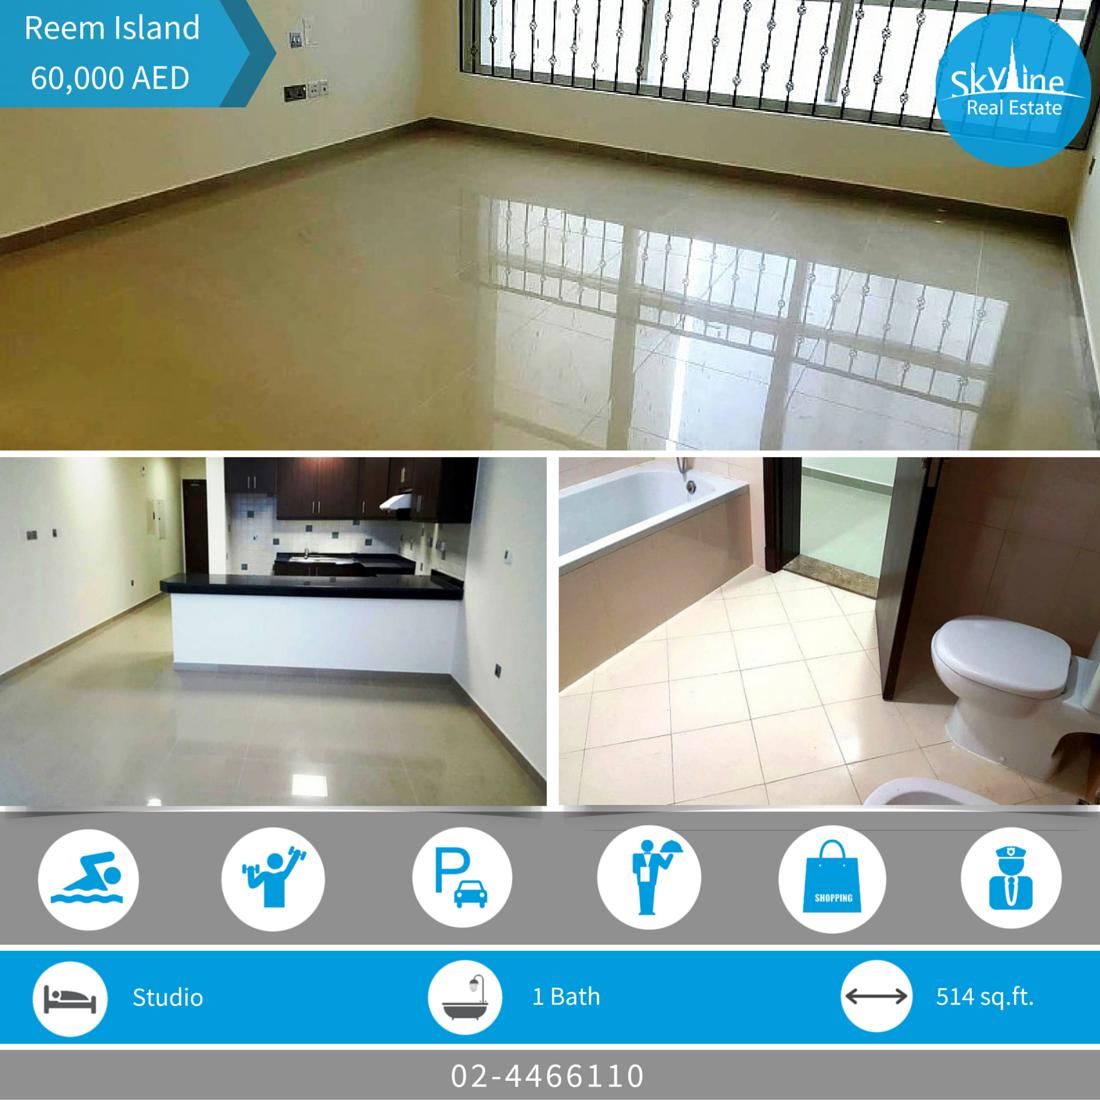 Affordable studio for rent in Hydra Avenue C6 (Al Reem Island) - Abu Dhabi, price: 60K.. Read more http://goo.gl/RuzREb